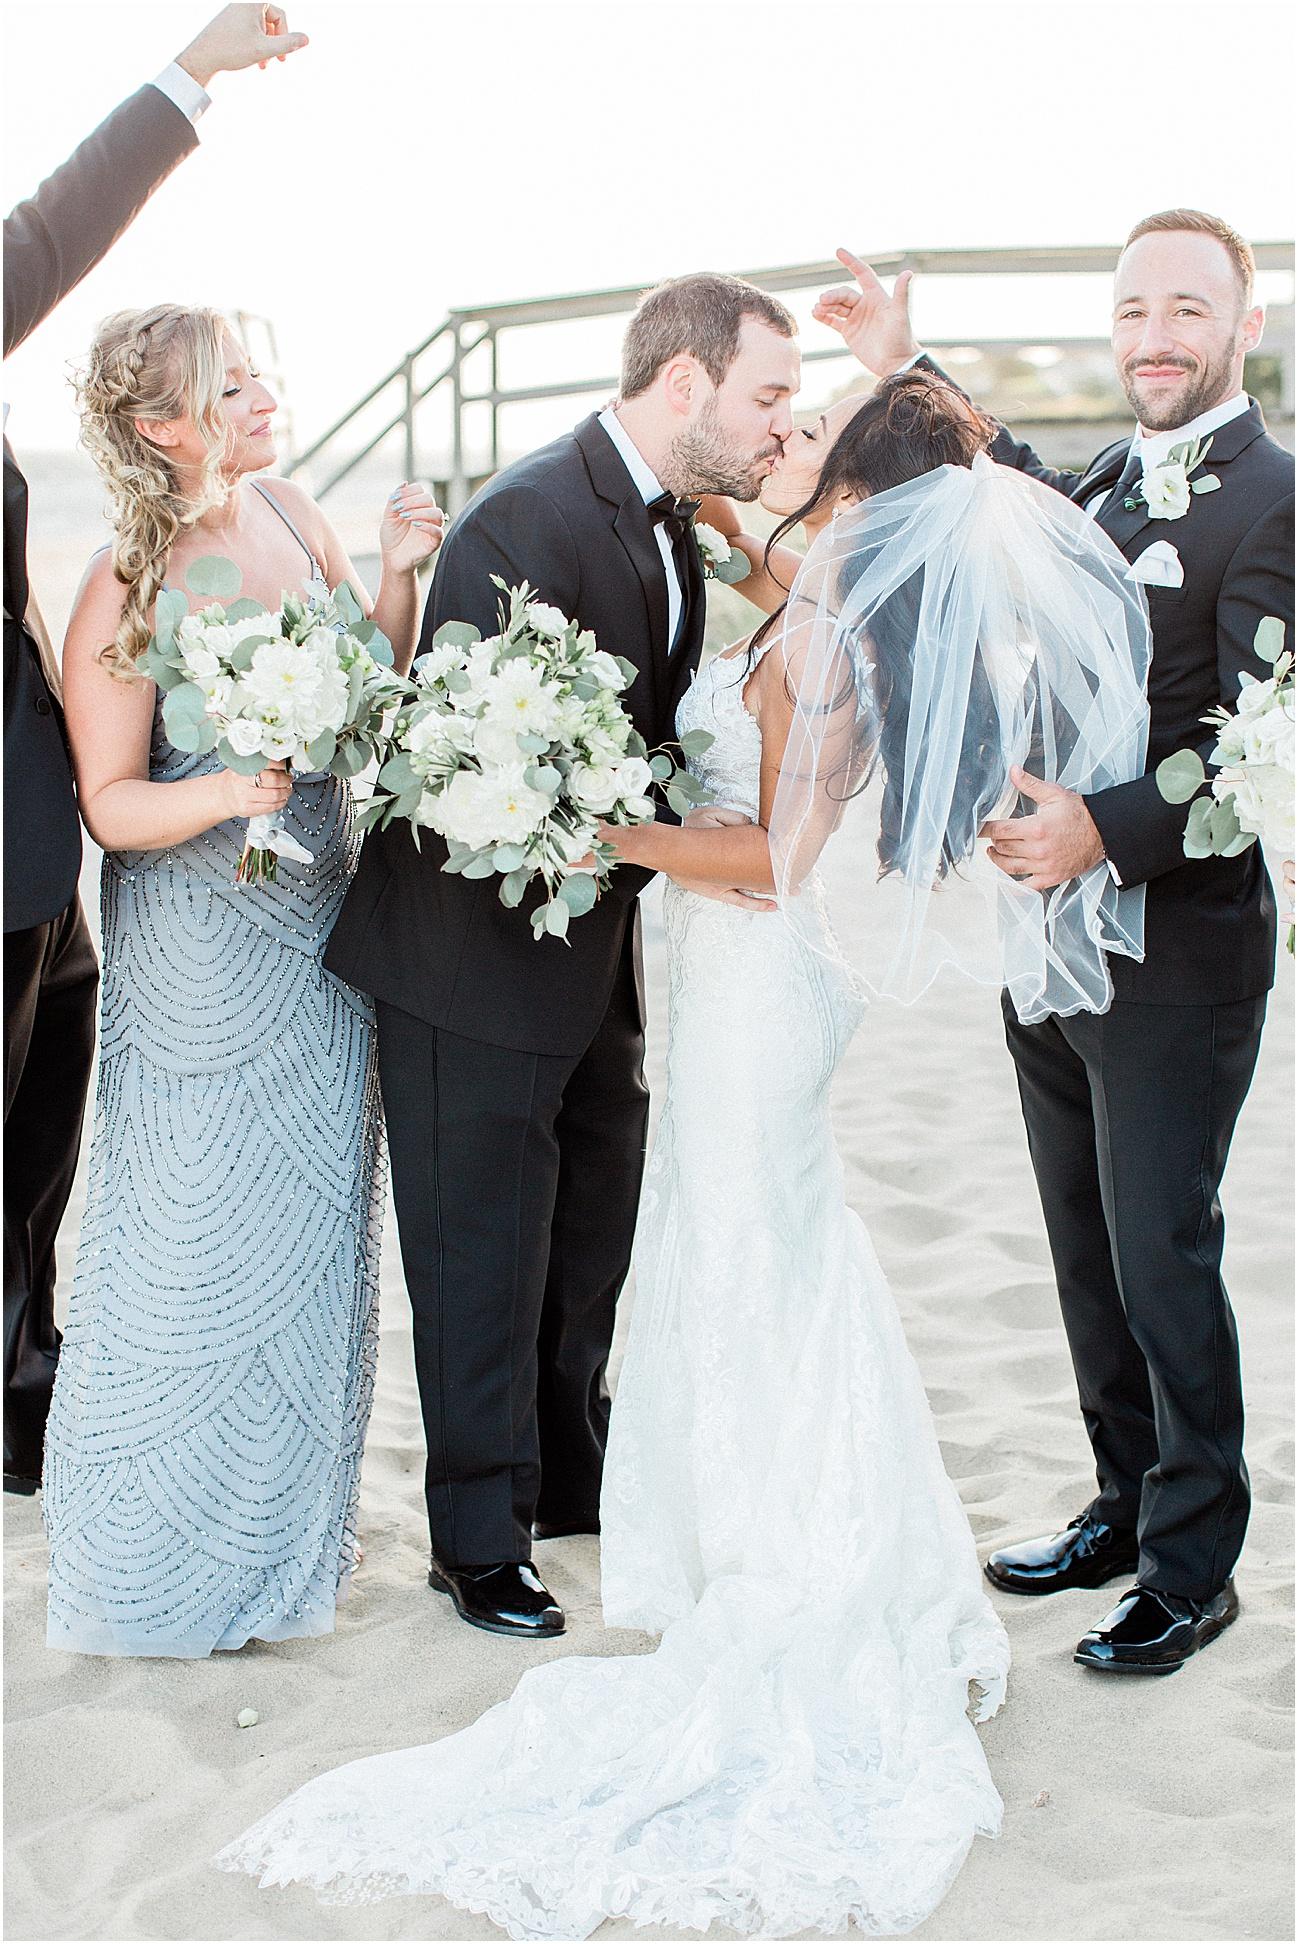 michelle_matt_popponesset_inn_celebrations_new_seabury_fall_cape_cod_boston_wedding_photographer_meredith_jane_photography_photo_1572.jpg